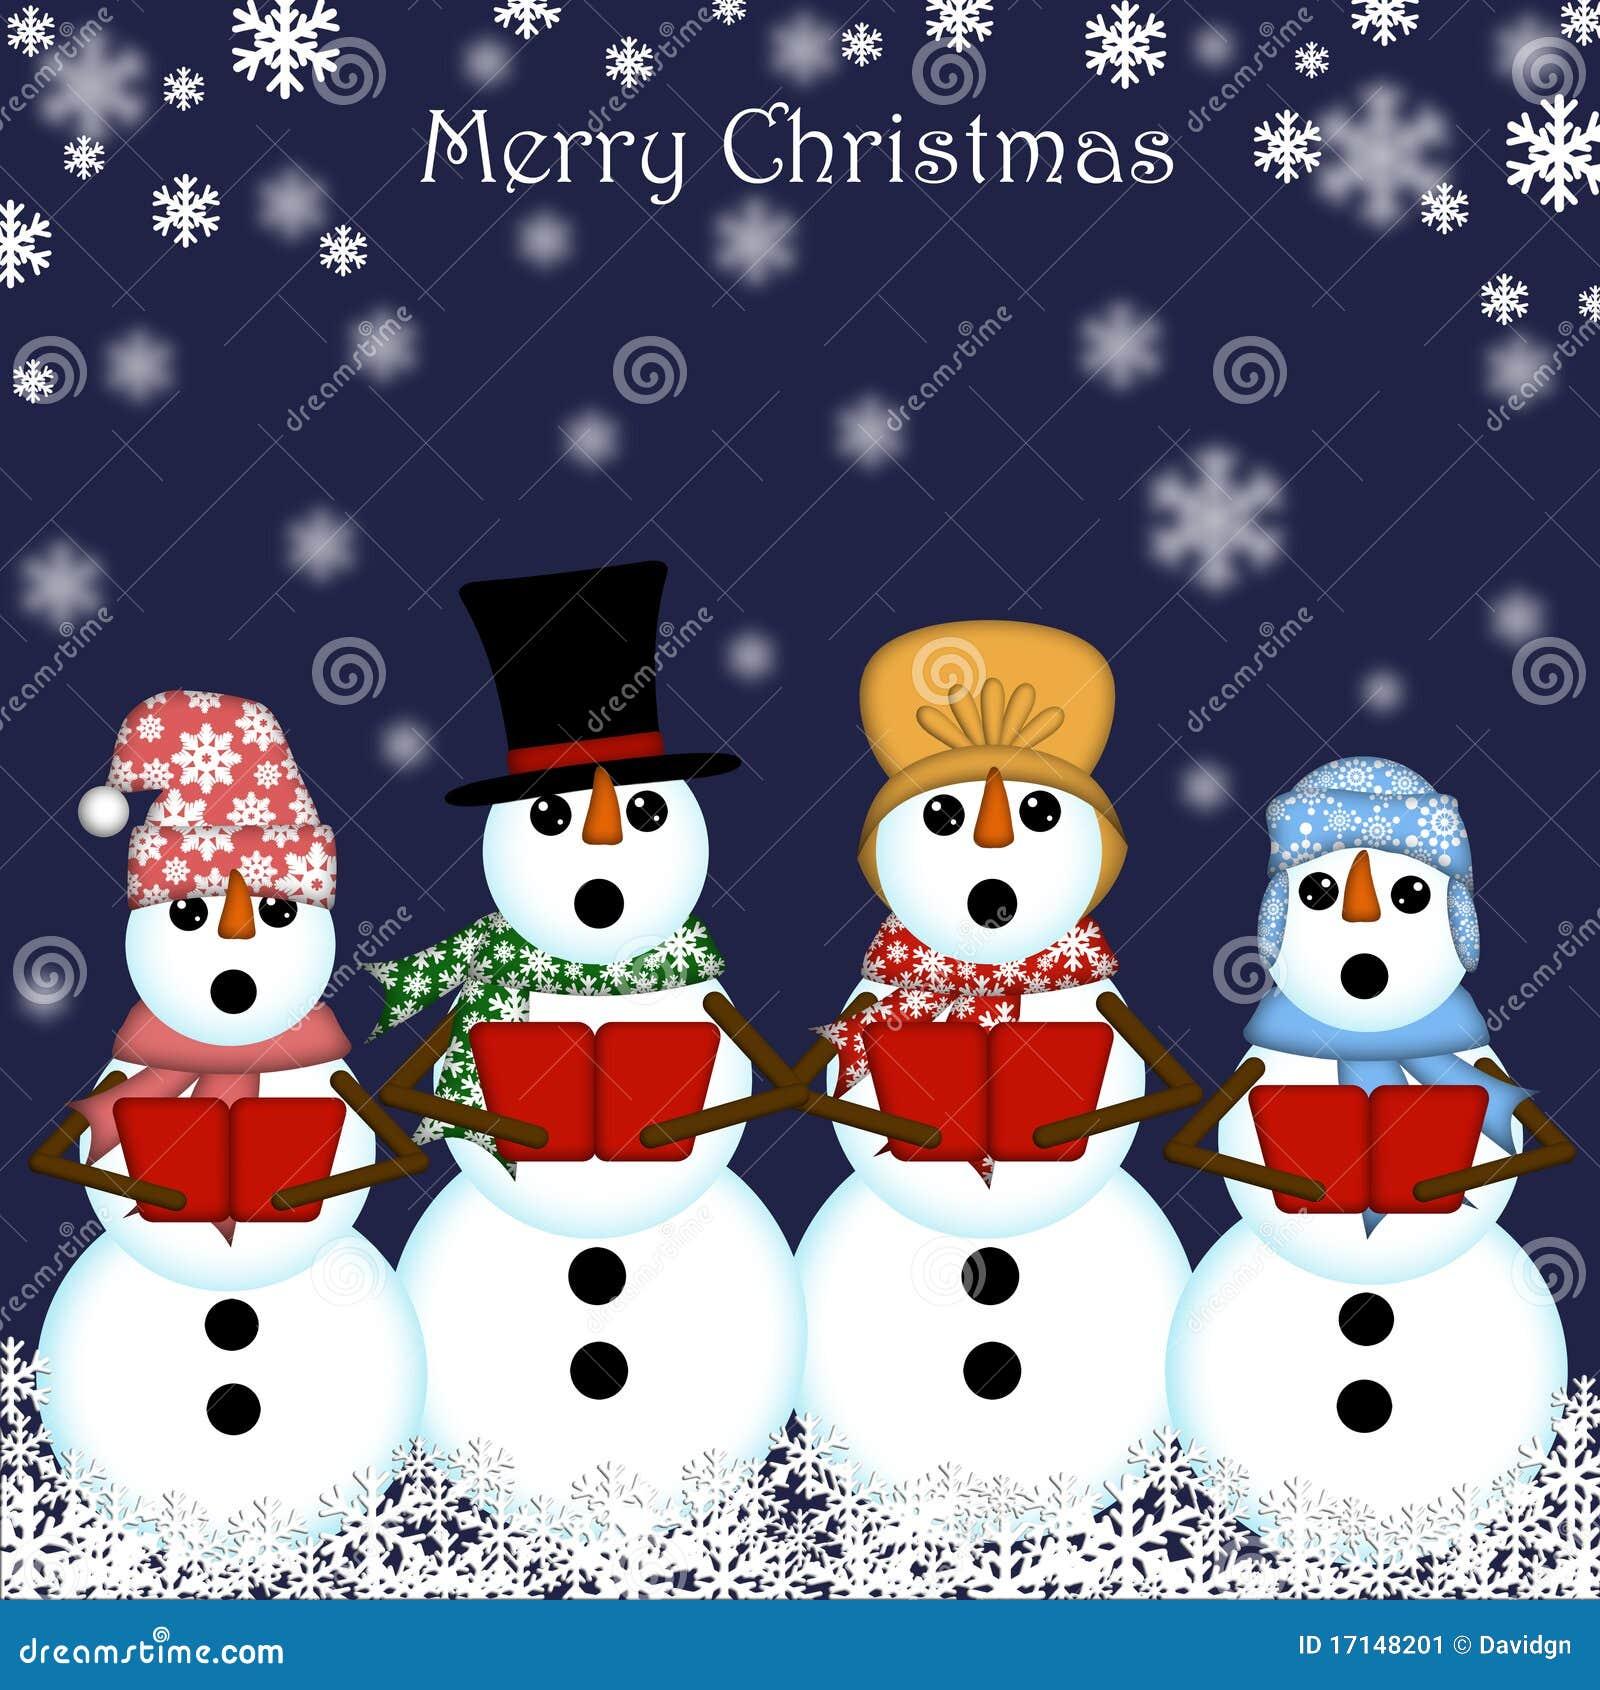 Christmas Snowman Carolers Singing Stock Image Image